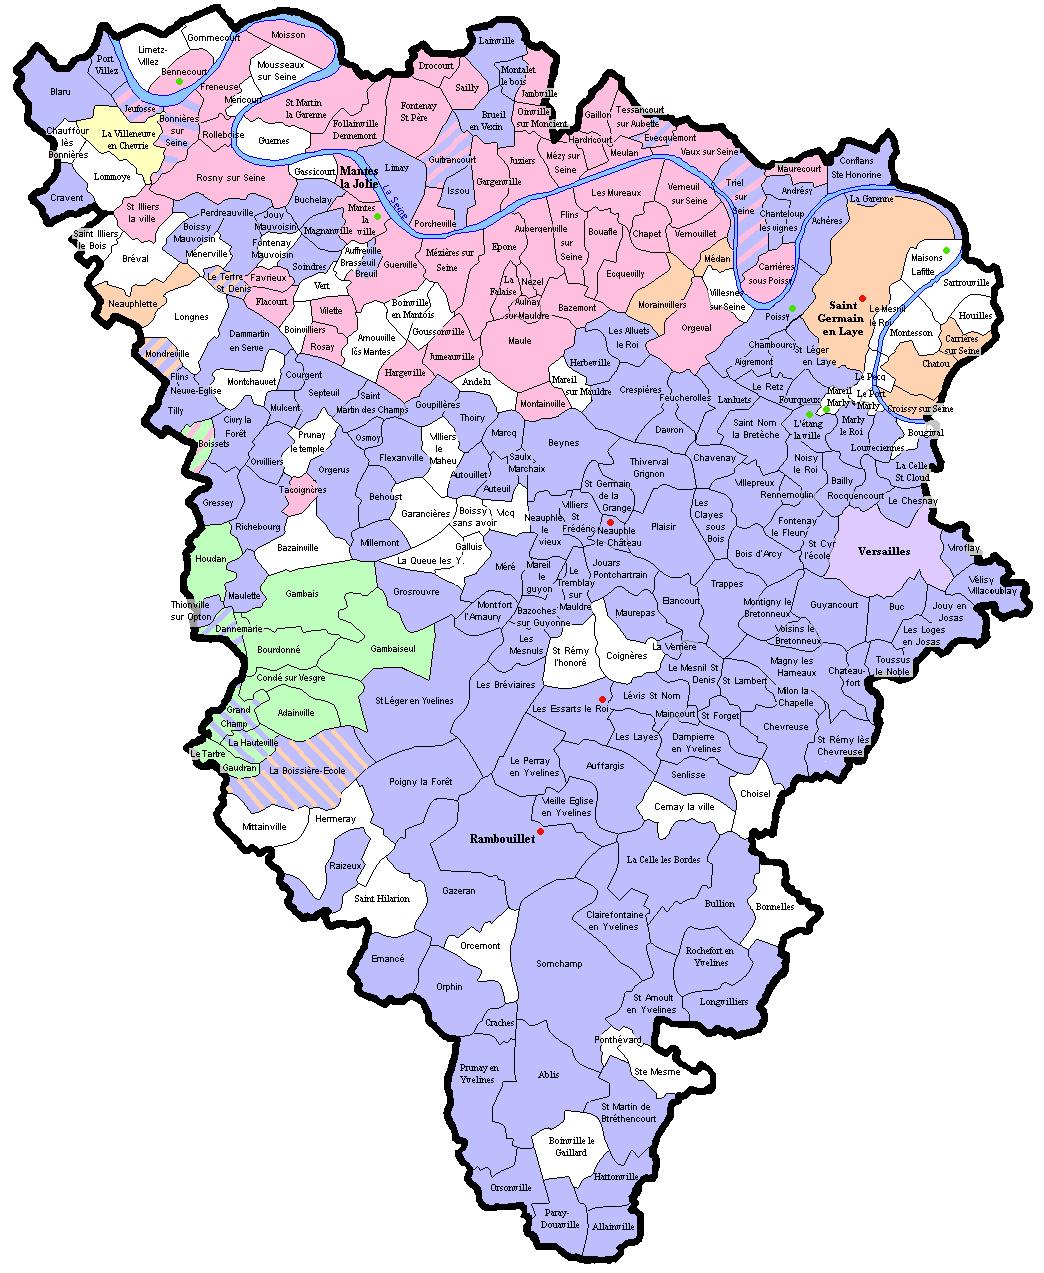 Carte des relev s des communes des yvelines wikigenweb for A voir dans les yvelines